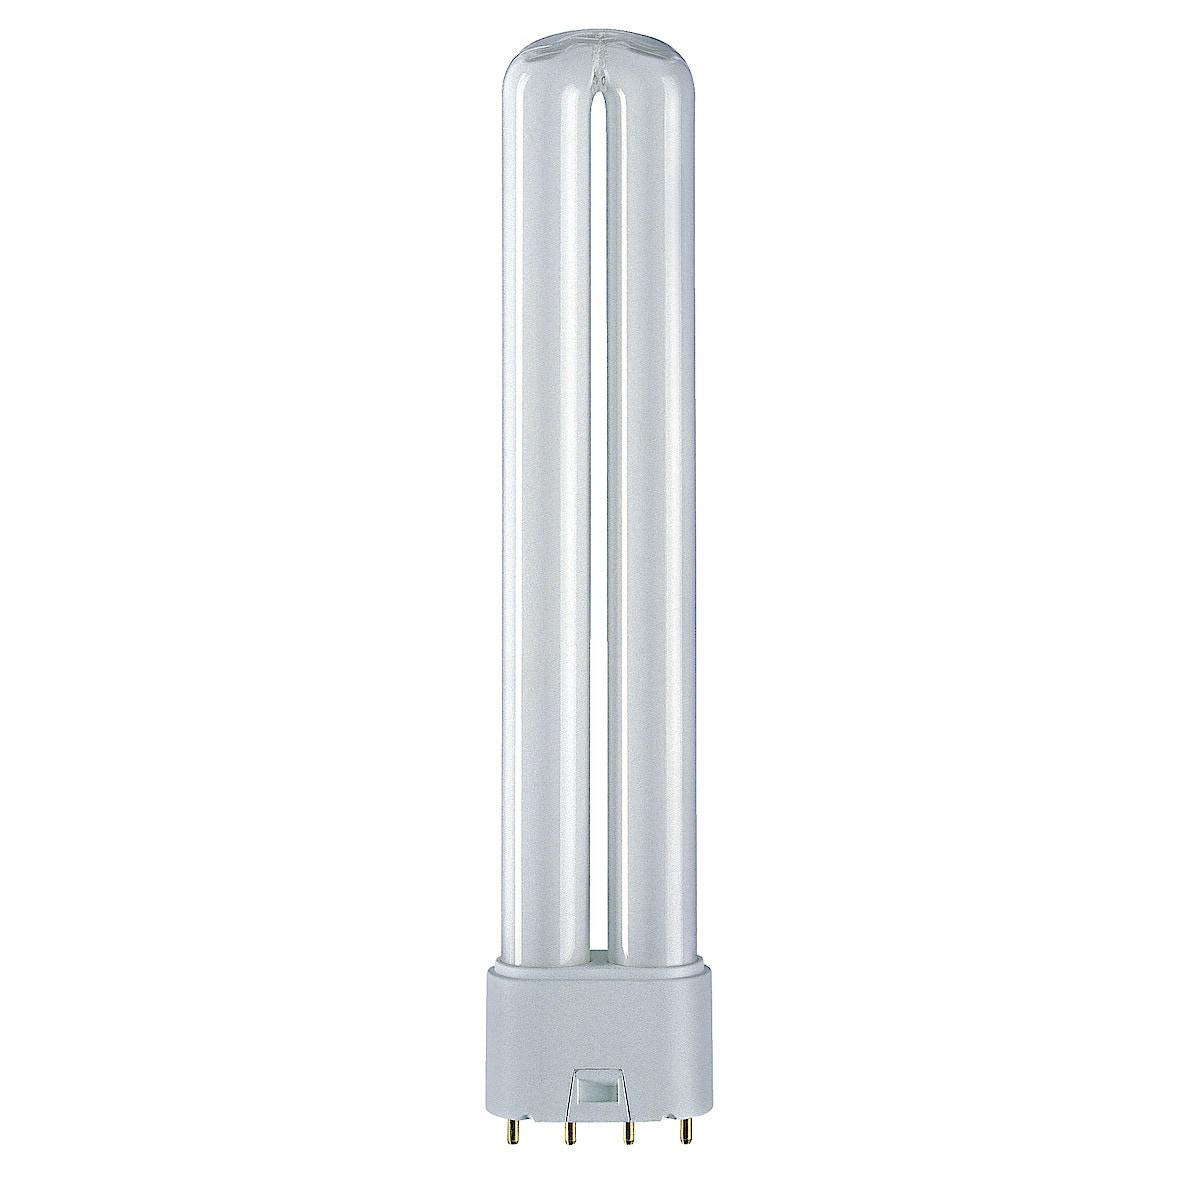 Kompaktlysrör Dulux L 36 W/830 2G11 Osram